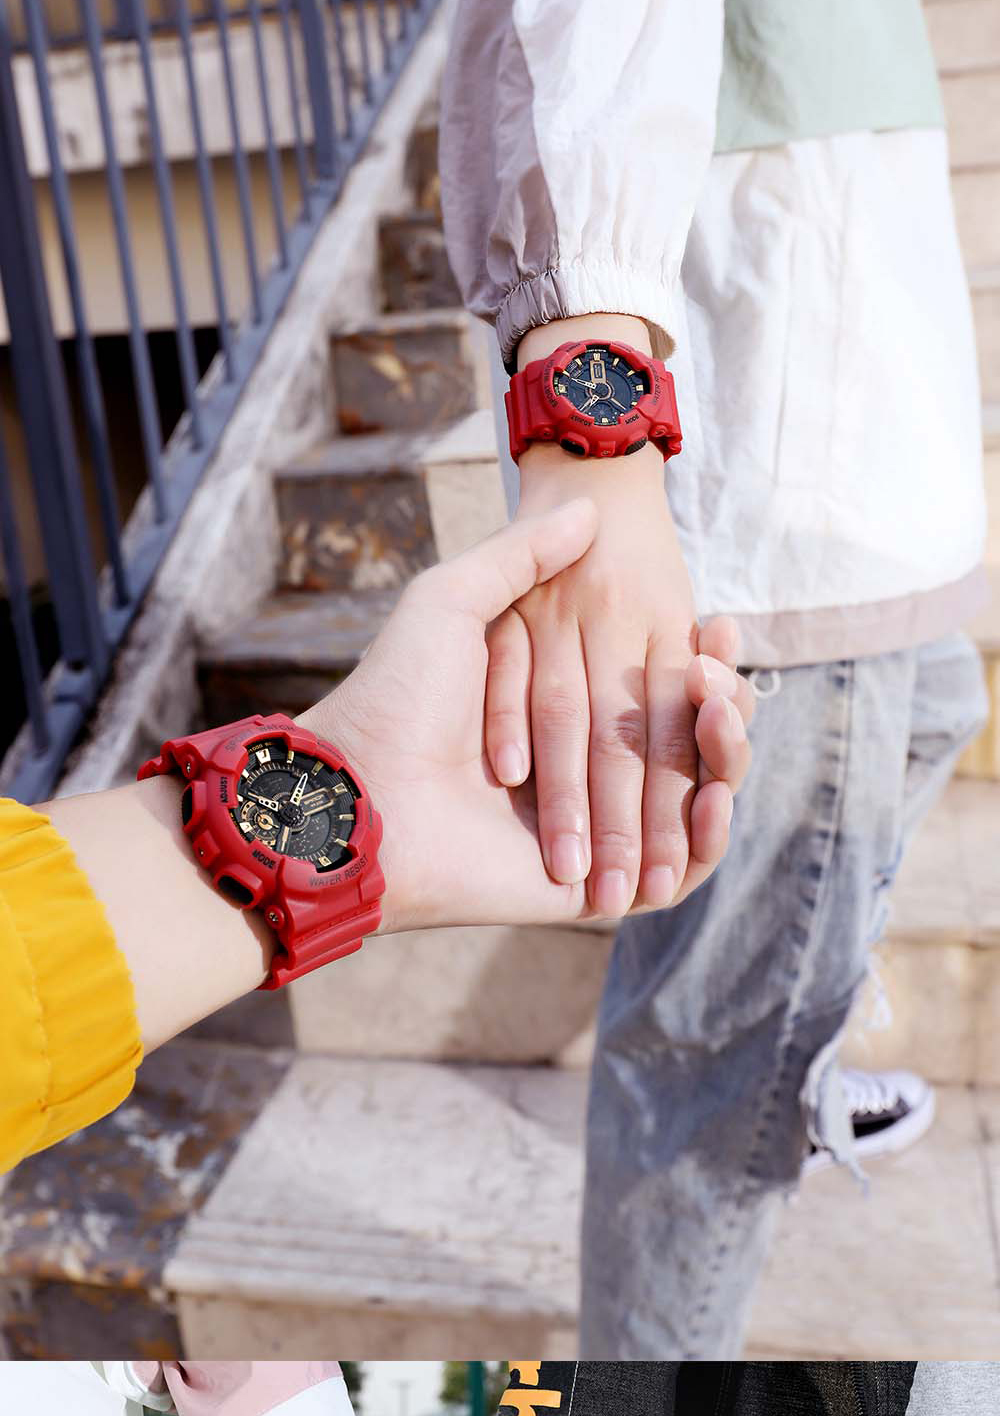 H825a889497f8439fb378486045de5fadz 2020 SANDA Military Men's Watch Brand Luxury Waterproof Sport Wristwatch Fashion Quartz Clock Couple Watch relogio masculino